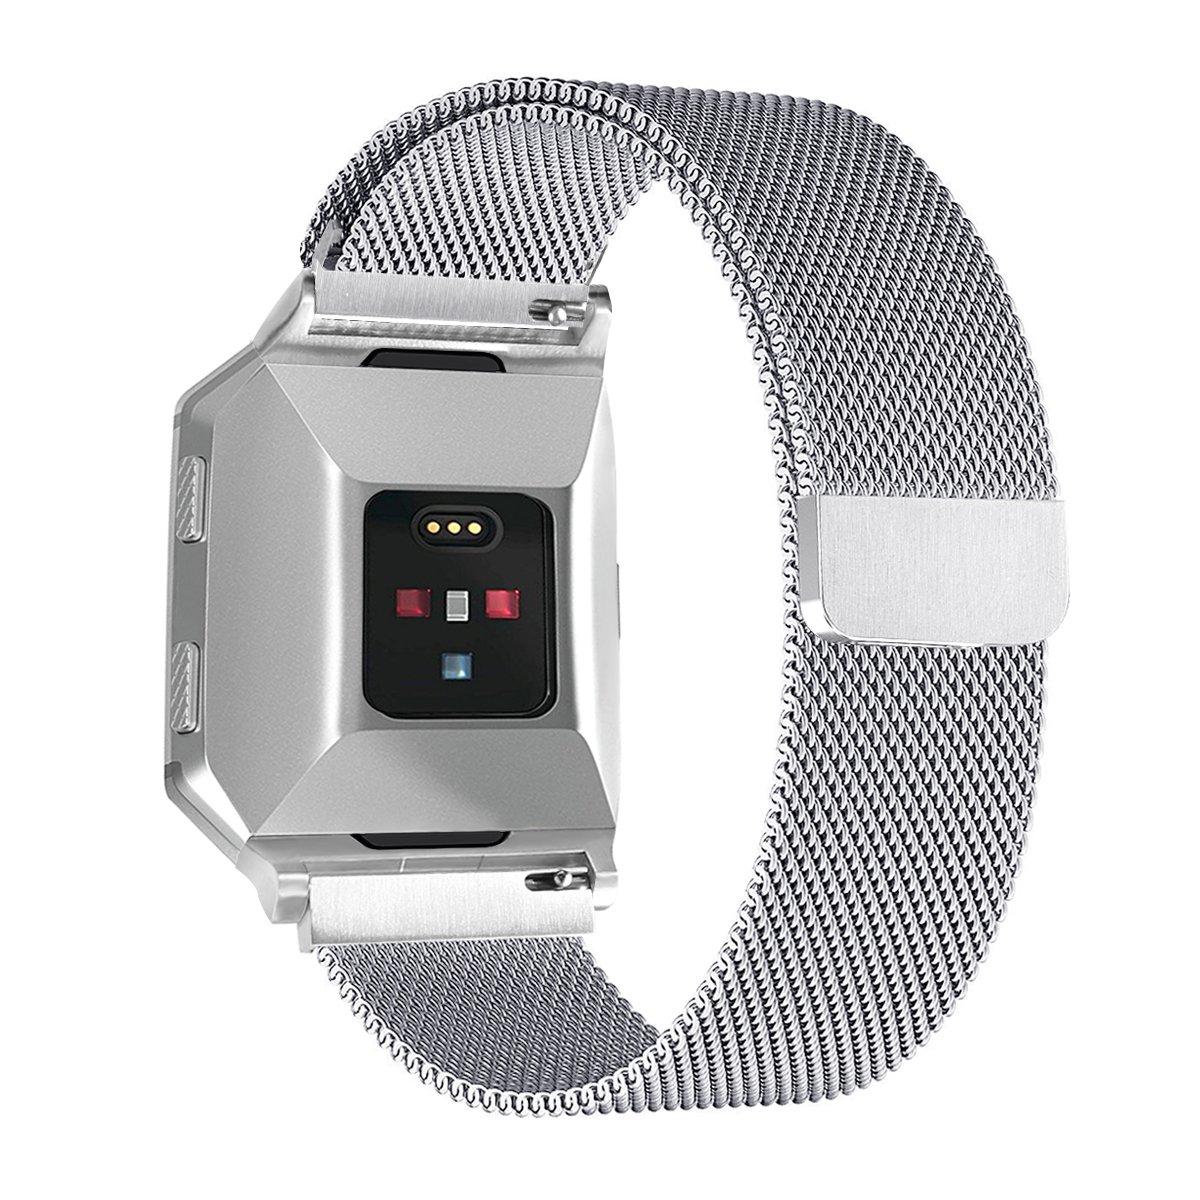 For FitbitイオンバンドMilanese磁気ステンレススチール交換アクセサリーメタル腕時計バンドブレスレットfor Fitbit Ionic、Small and Large Large(6.7